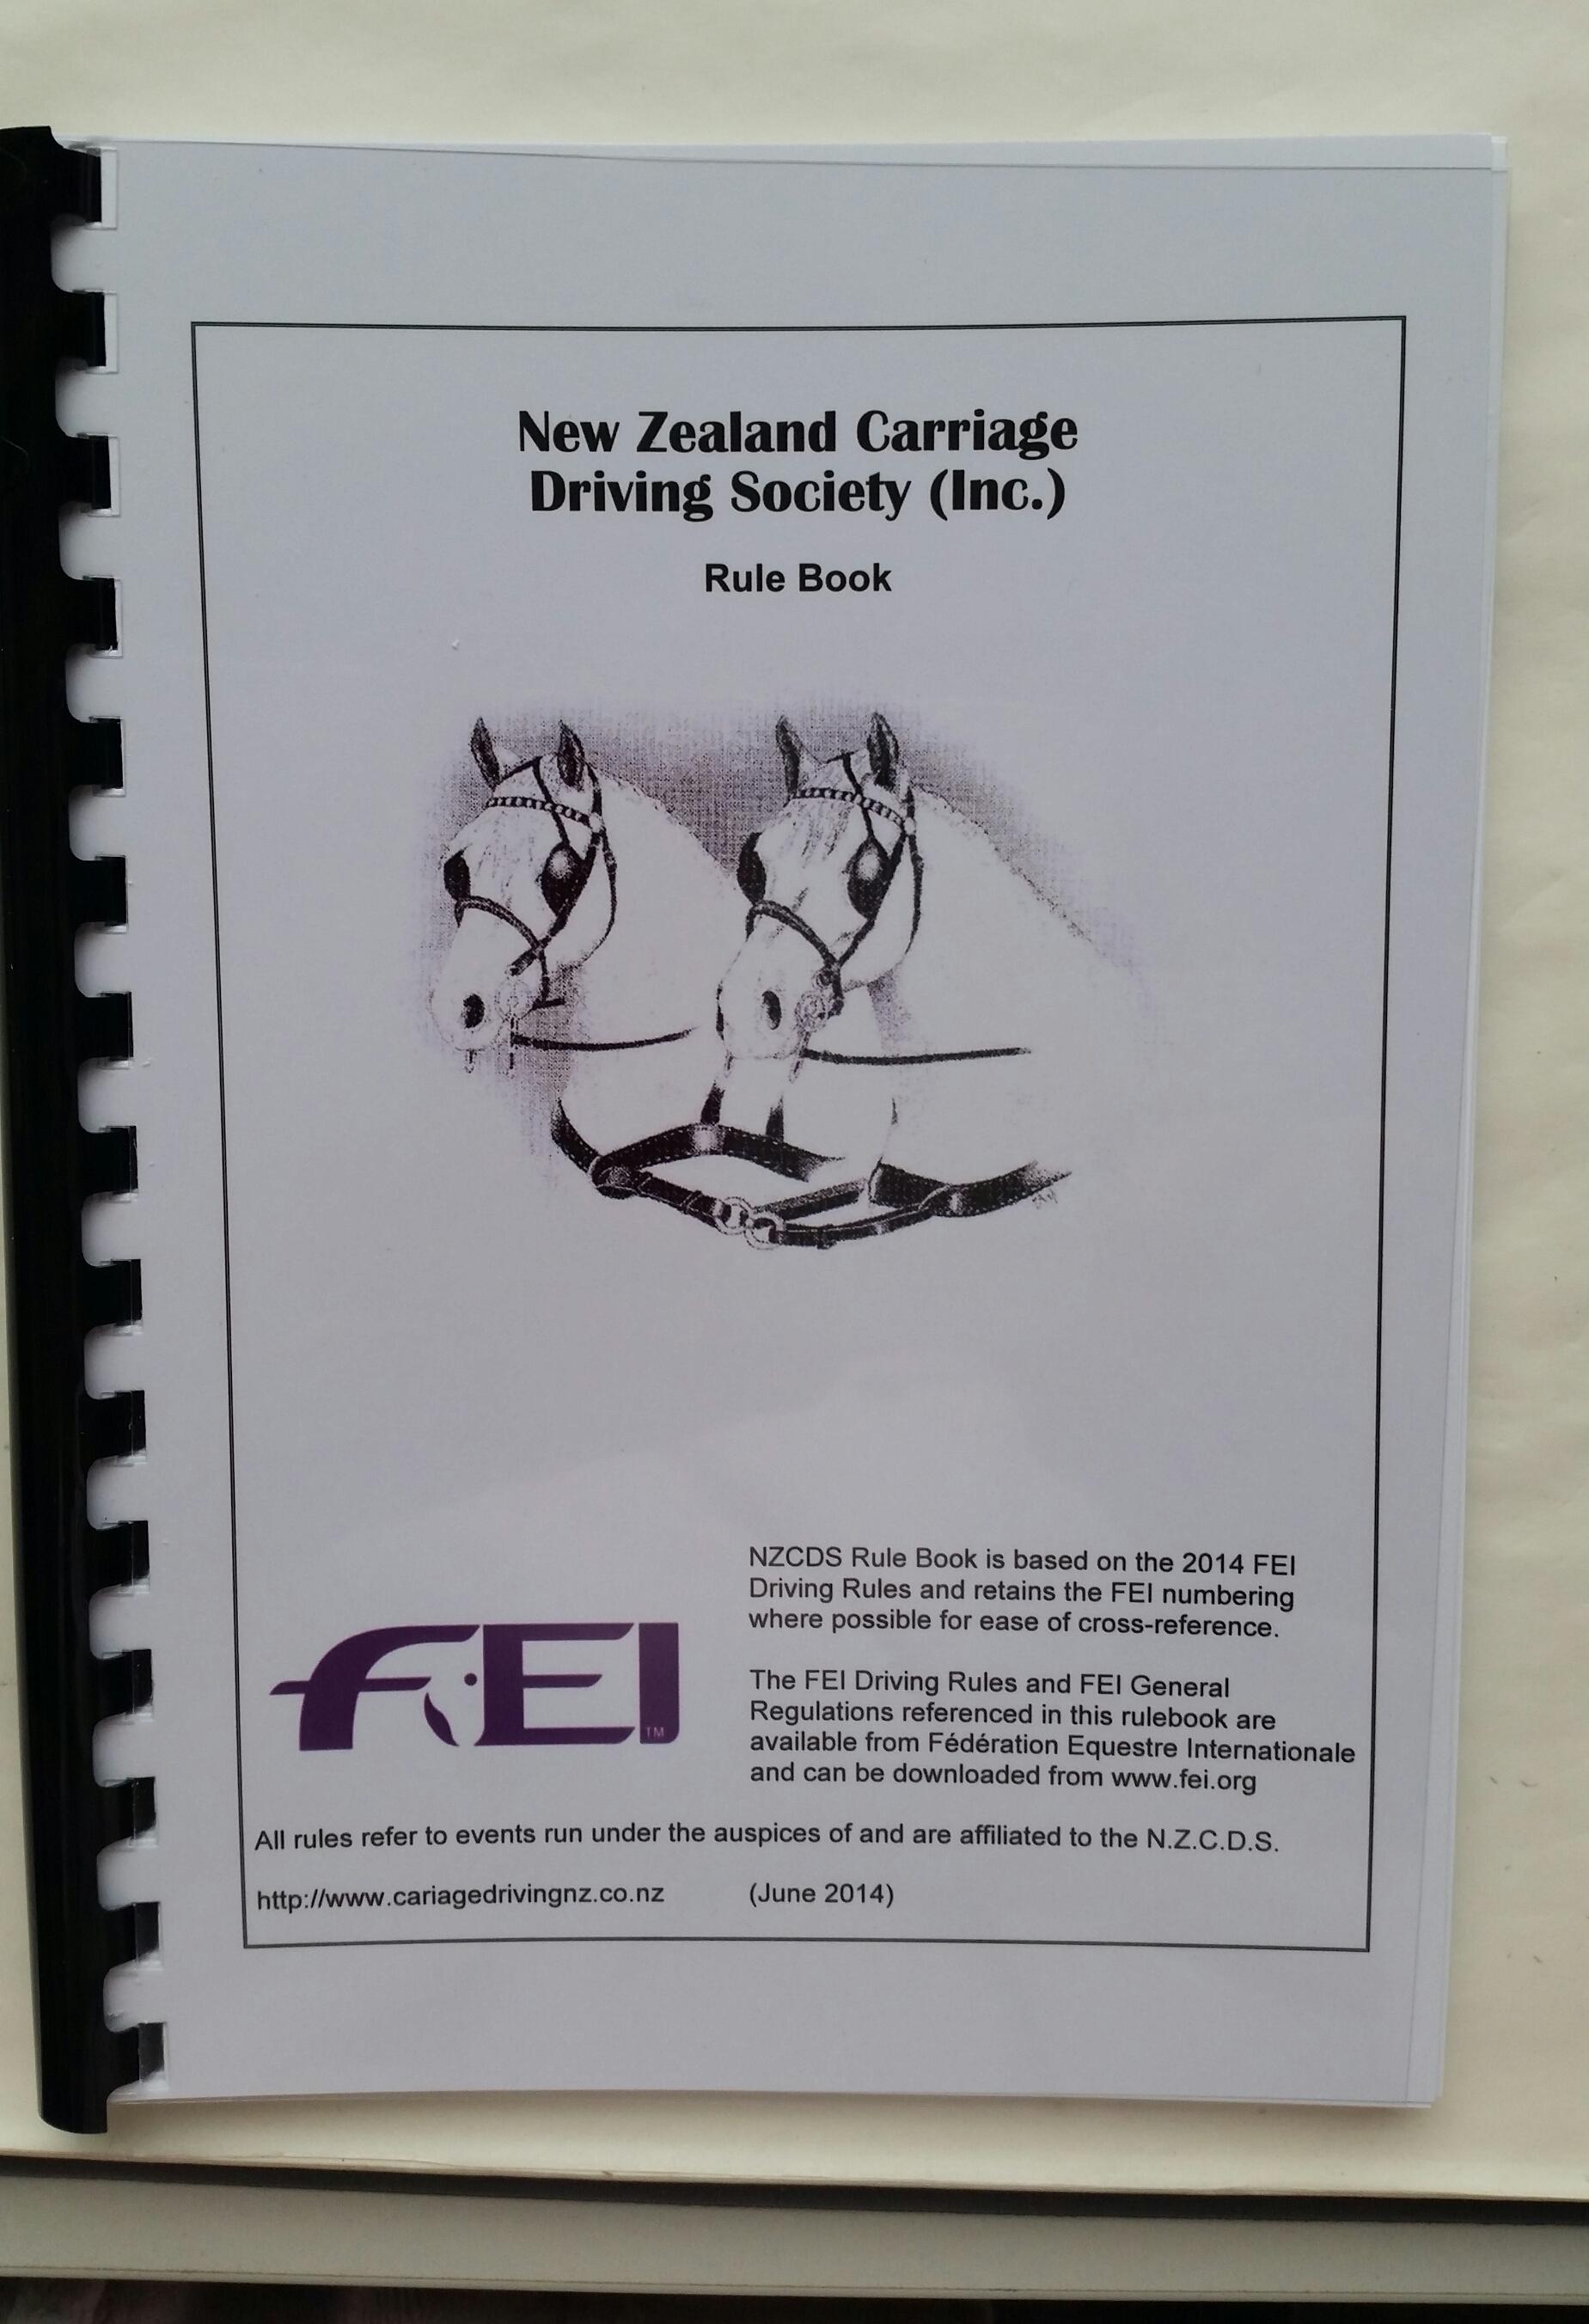 NZCDSRulebook